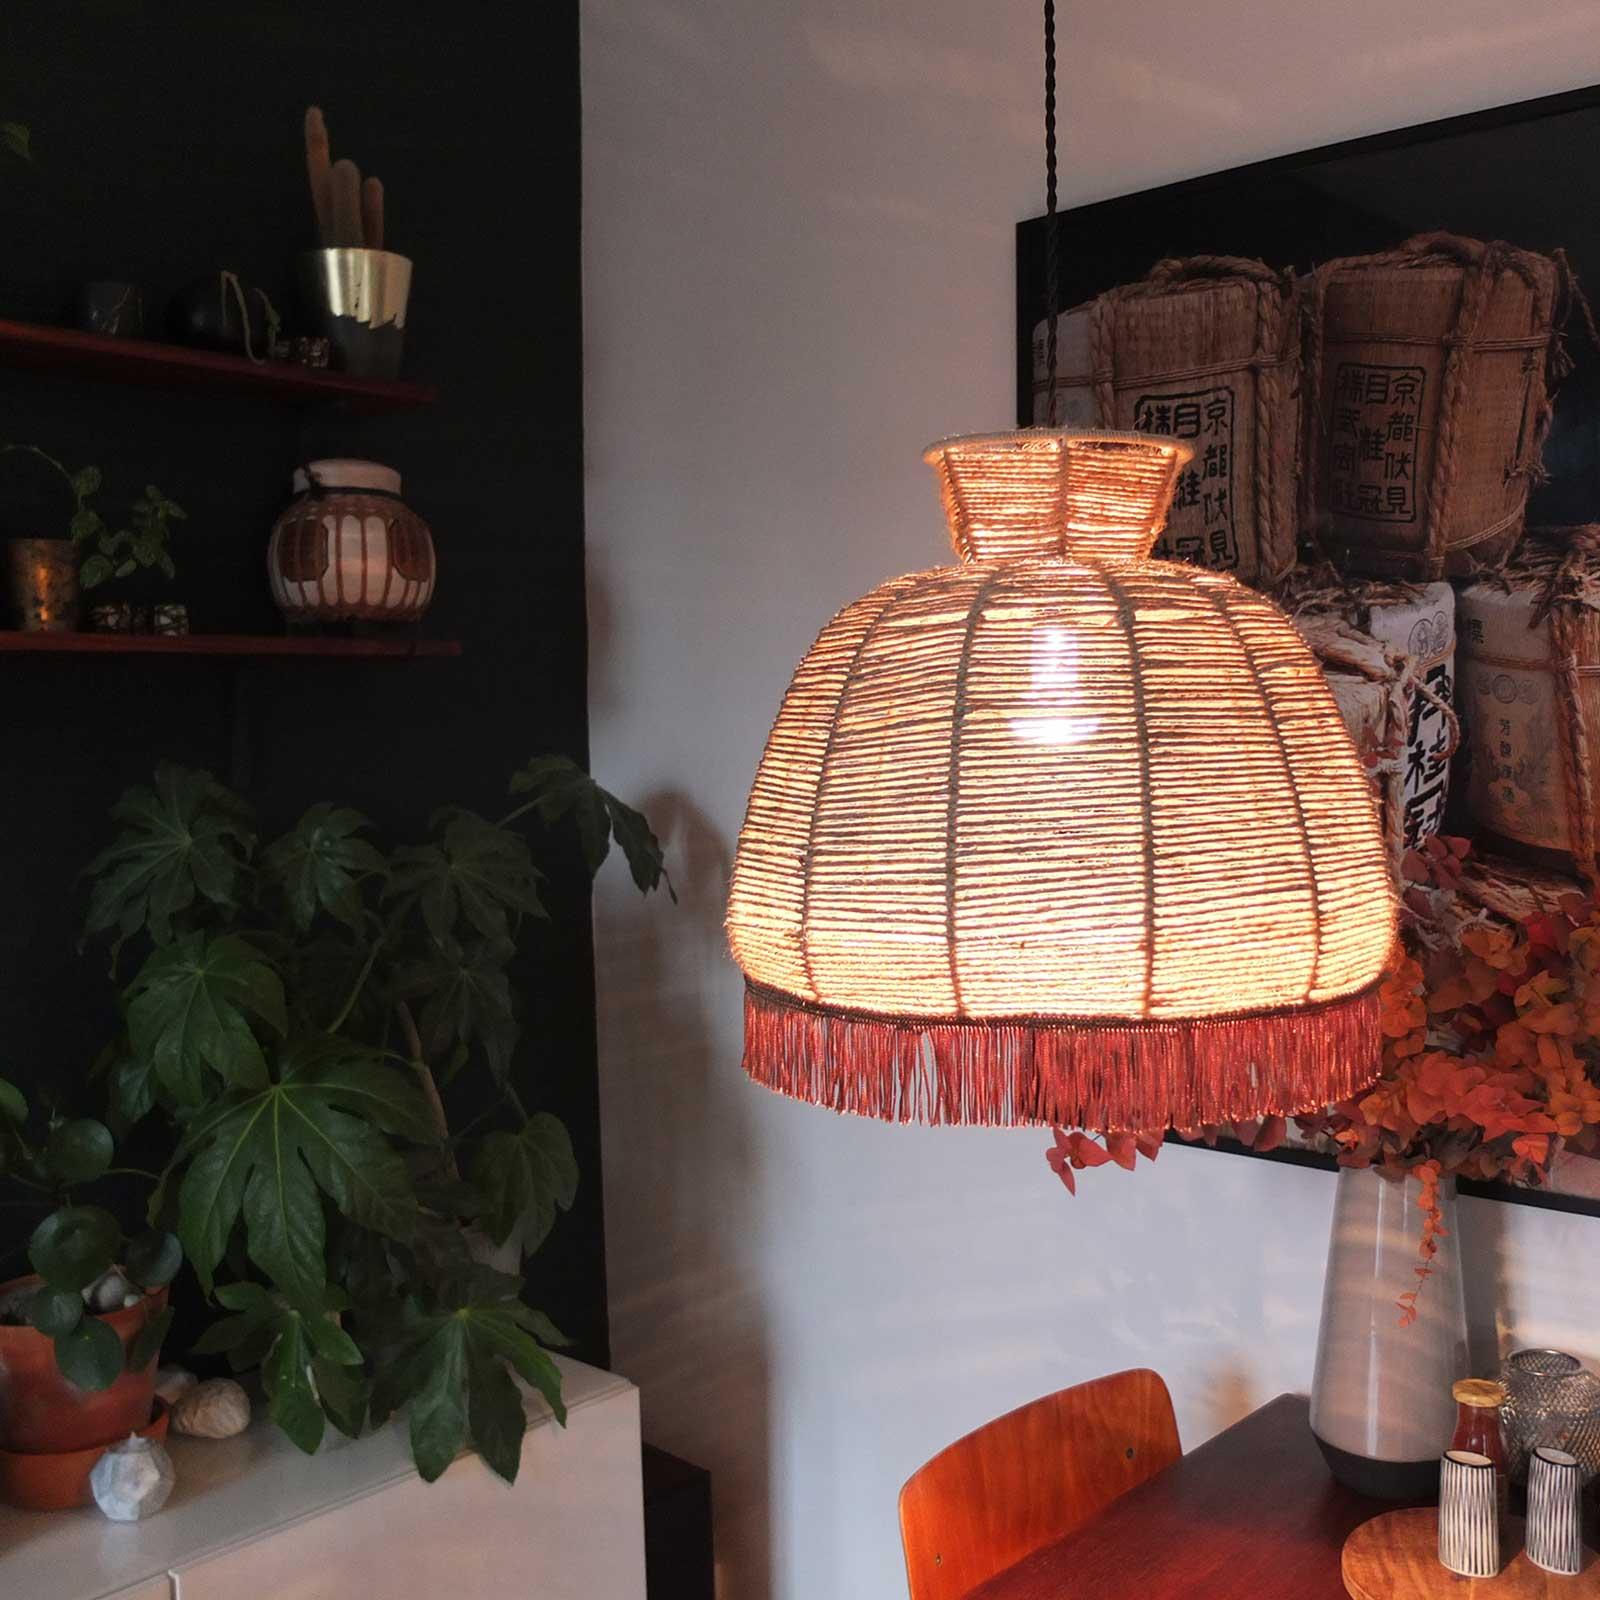 diy abat jour ficelle misc webzine. Black Bedroom Furniture Sets. Home Design Ideas